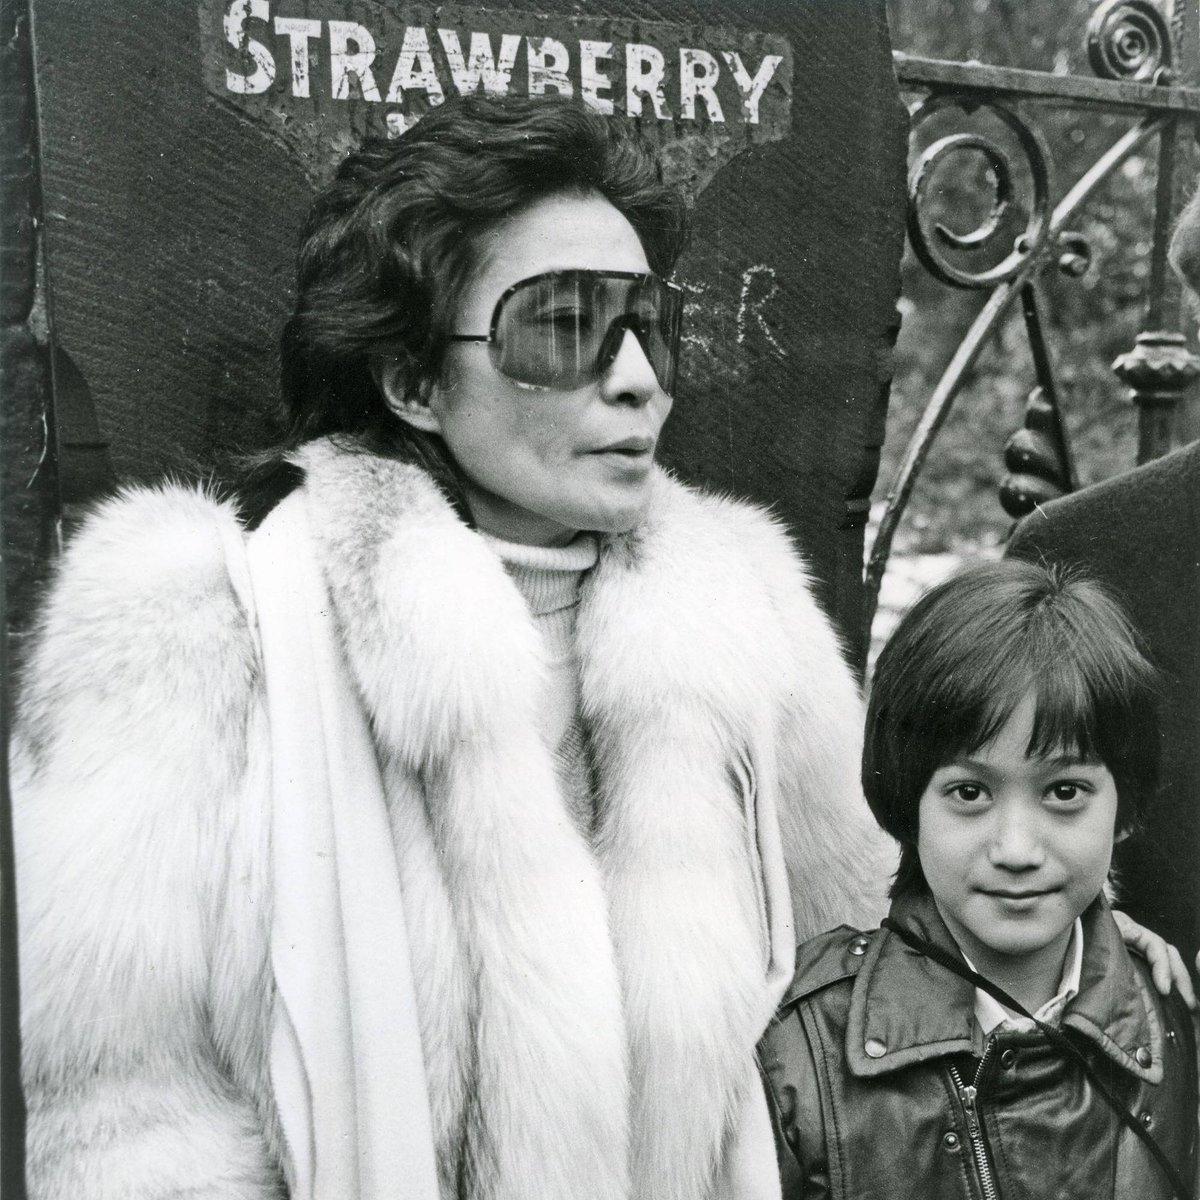 Happy 87th Birthday to Yoko Ono! @yokoono  Visiting Strawberry Field with Sean in 1984. #HappyBirthdayYoko https://t.co/PJvvb8f9wb